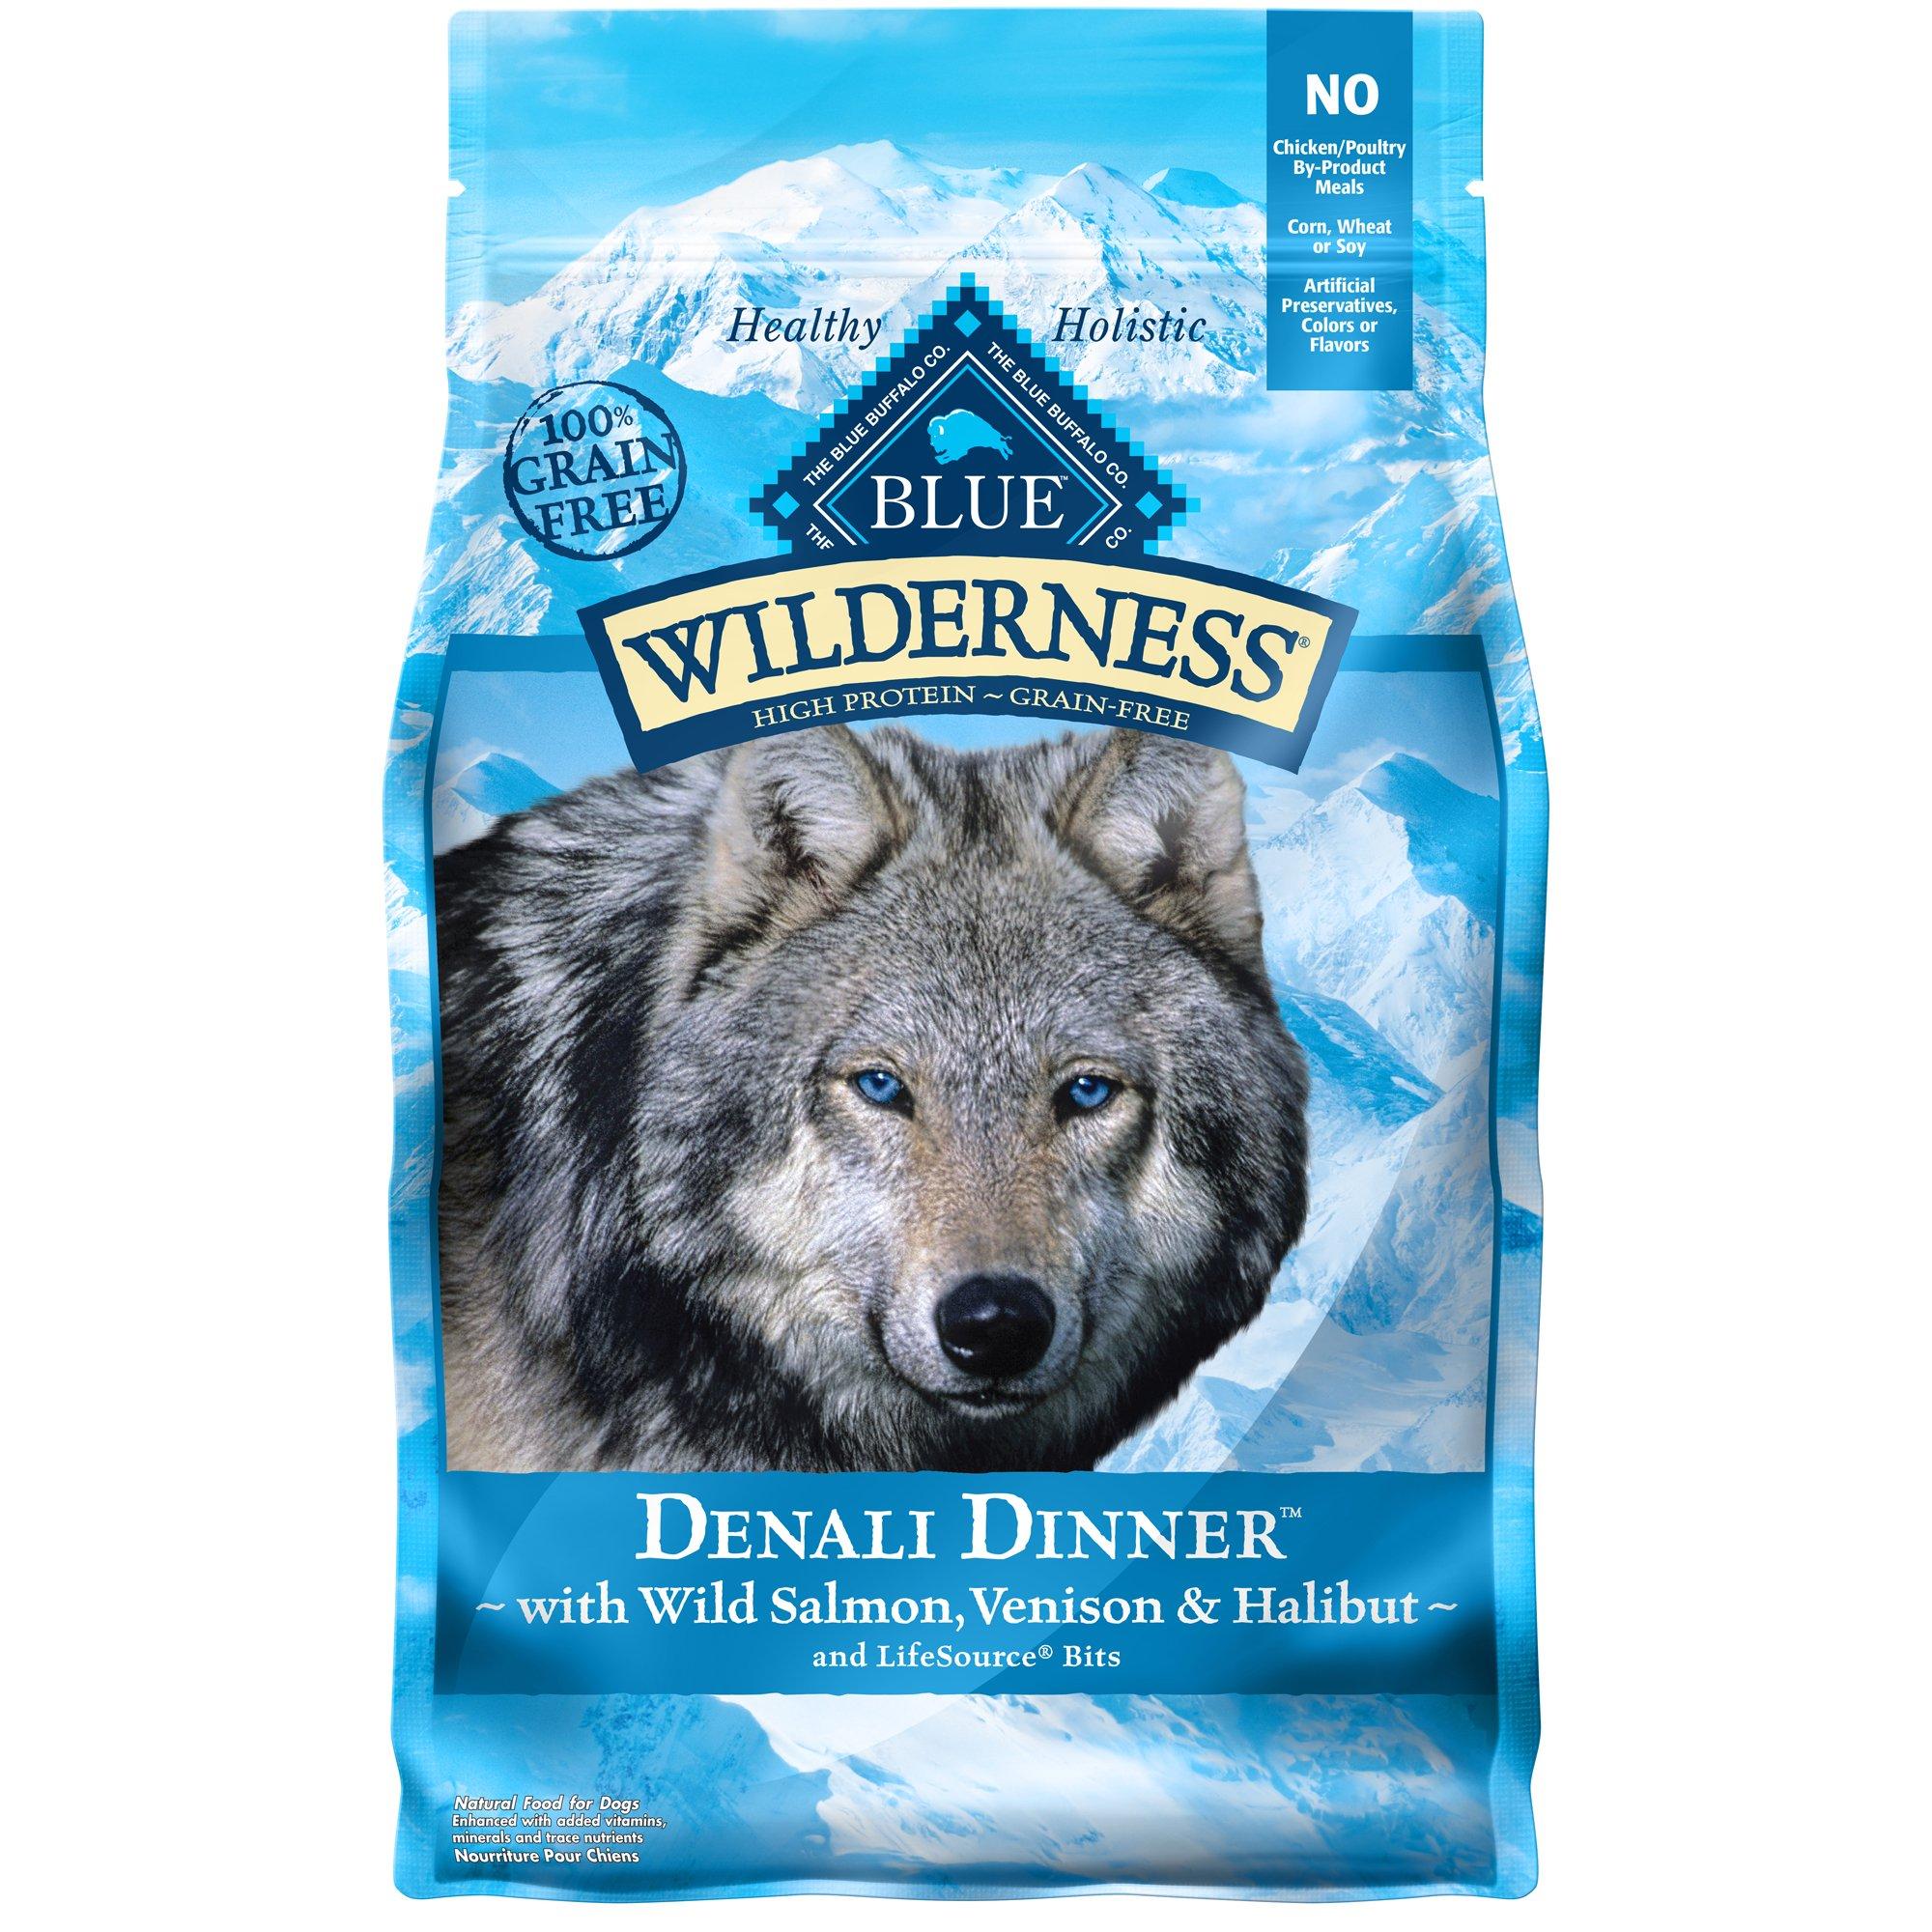 Blue Wilderness Dog Food